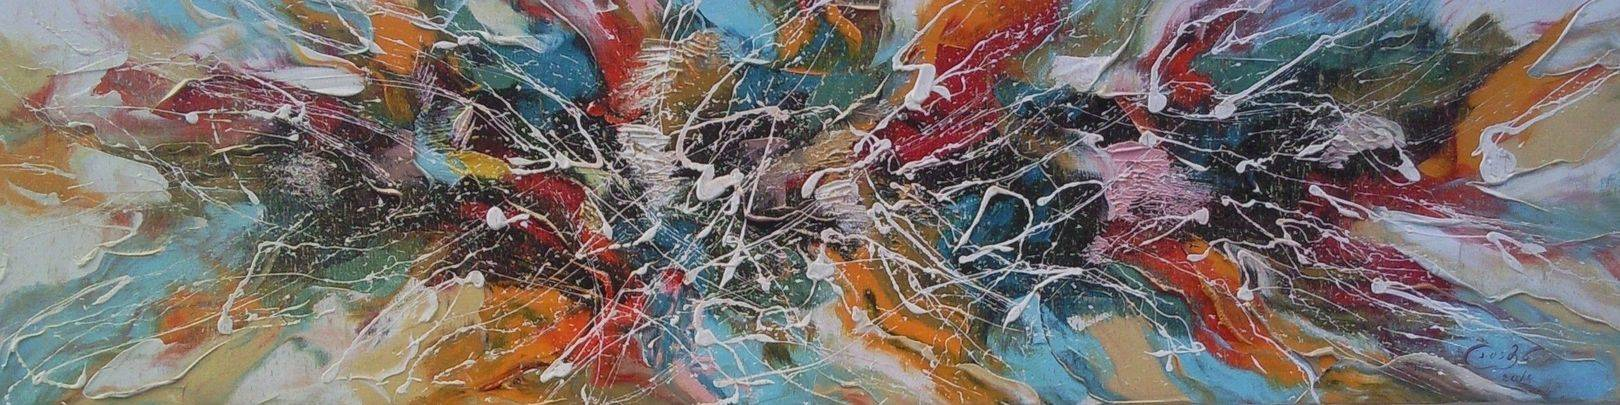 «Цветы»                 холст, масло «Flowers»               oil on canvas                                                    25x75,  2014